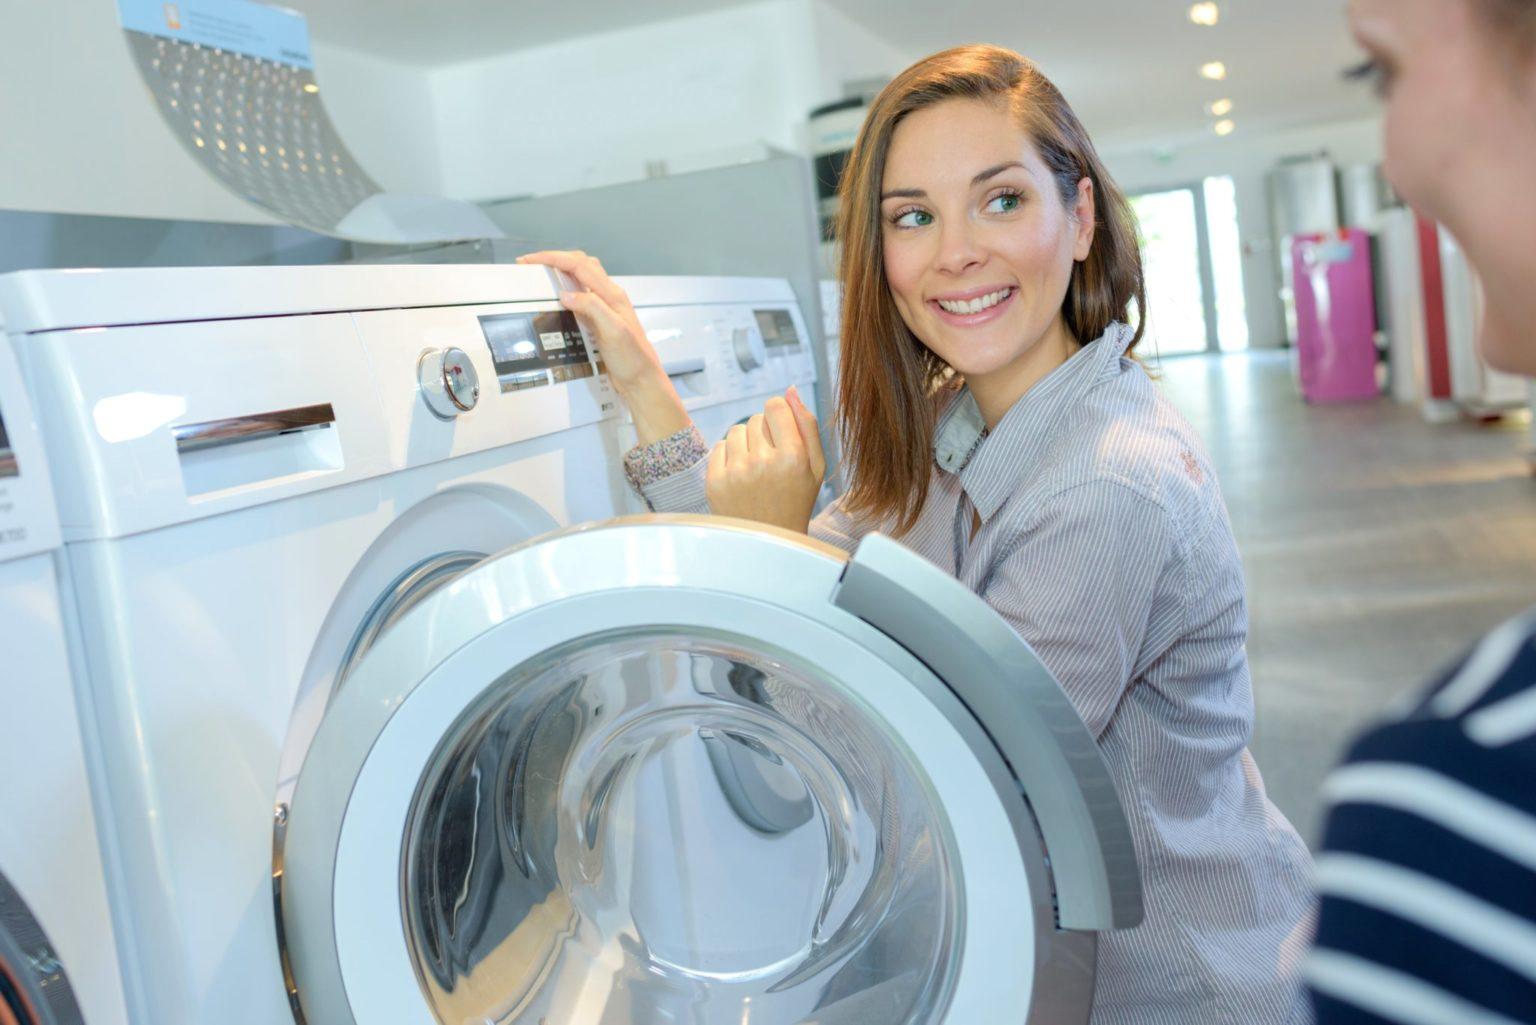 green products, green appliances green washing machine, energy efficient appliances, watersense